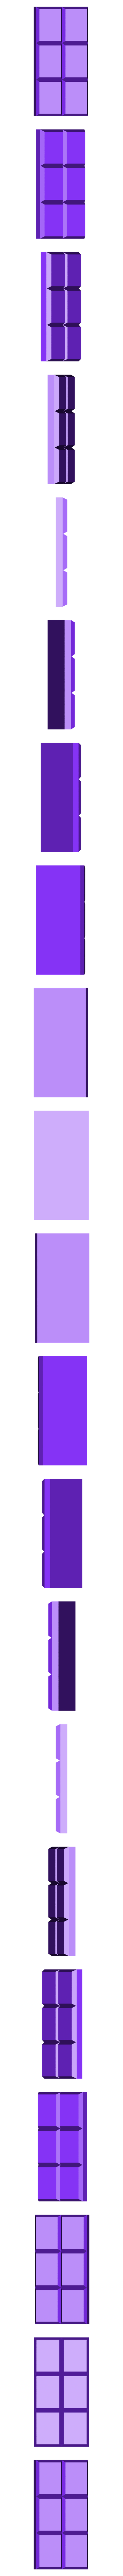 3_2.stl Download STL file Chocolate Bar Puzzle • 3D print design, mtairymd